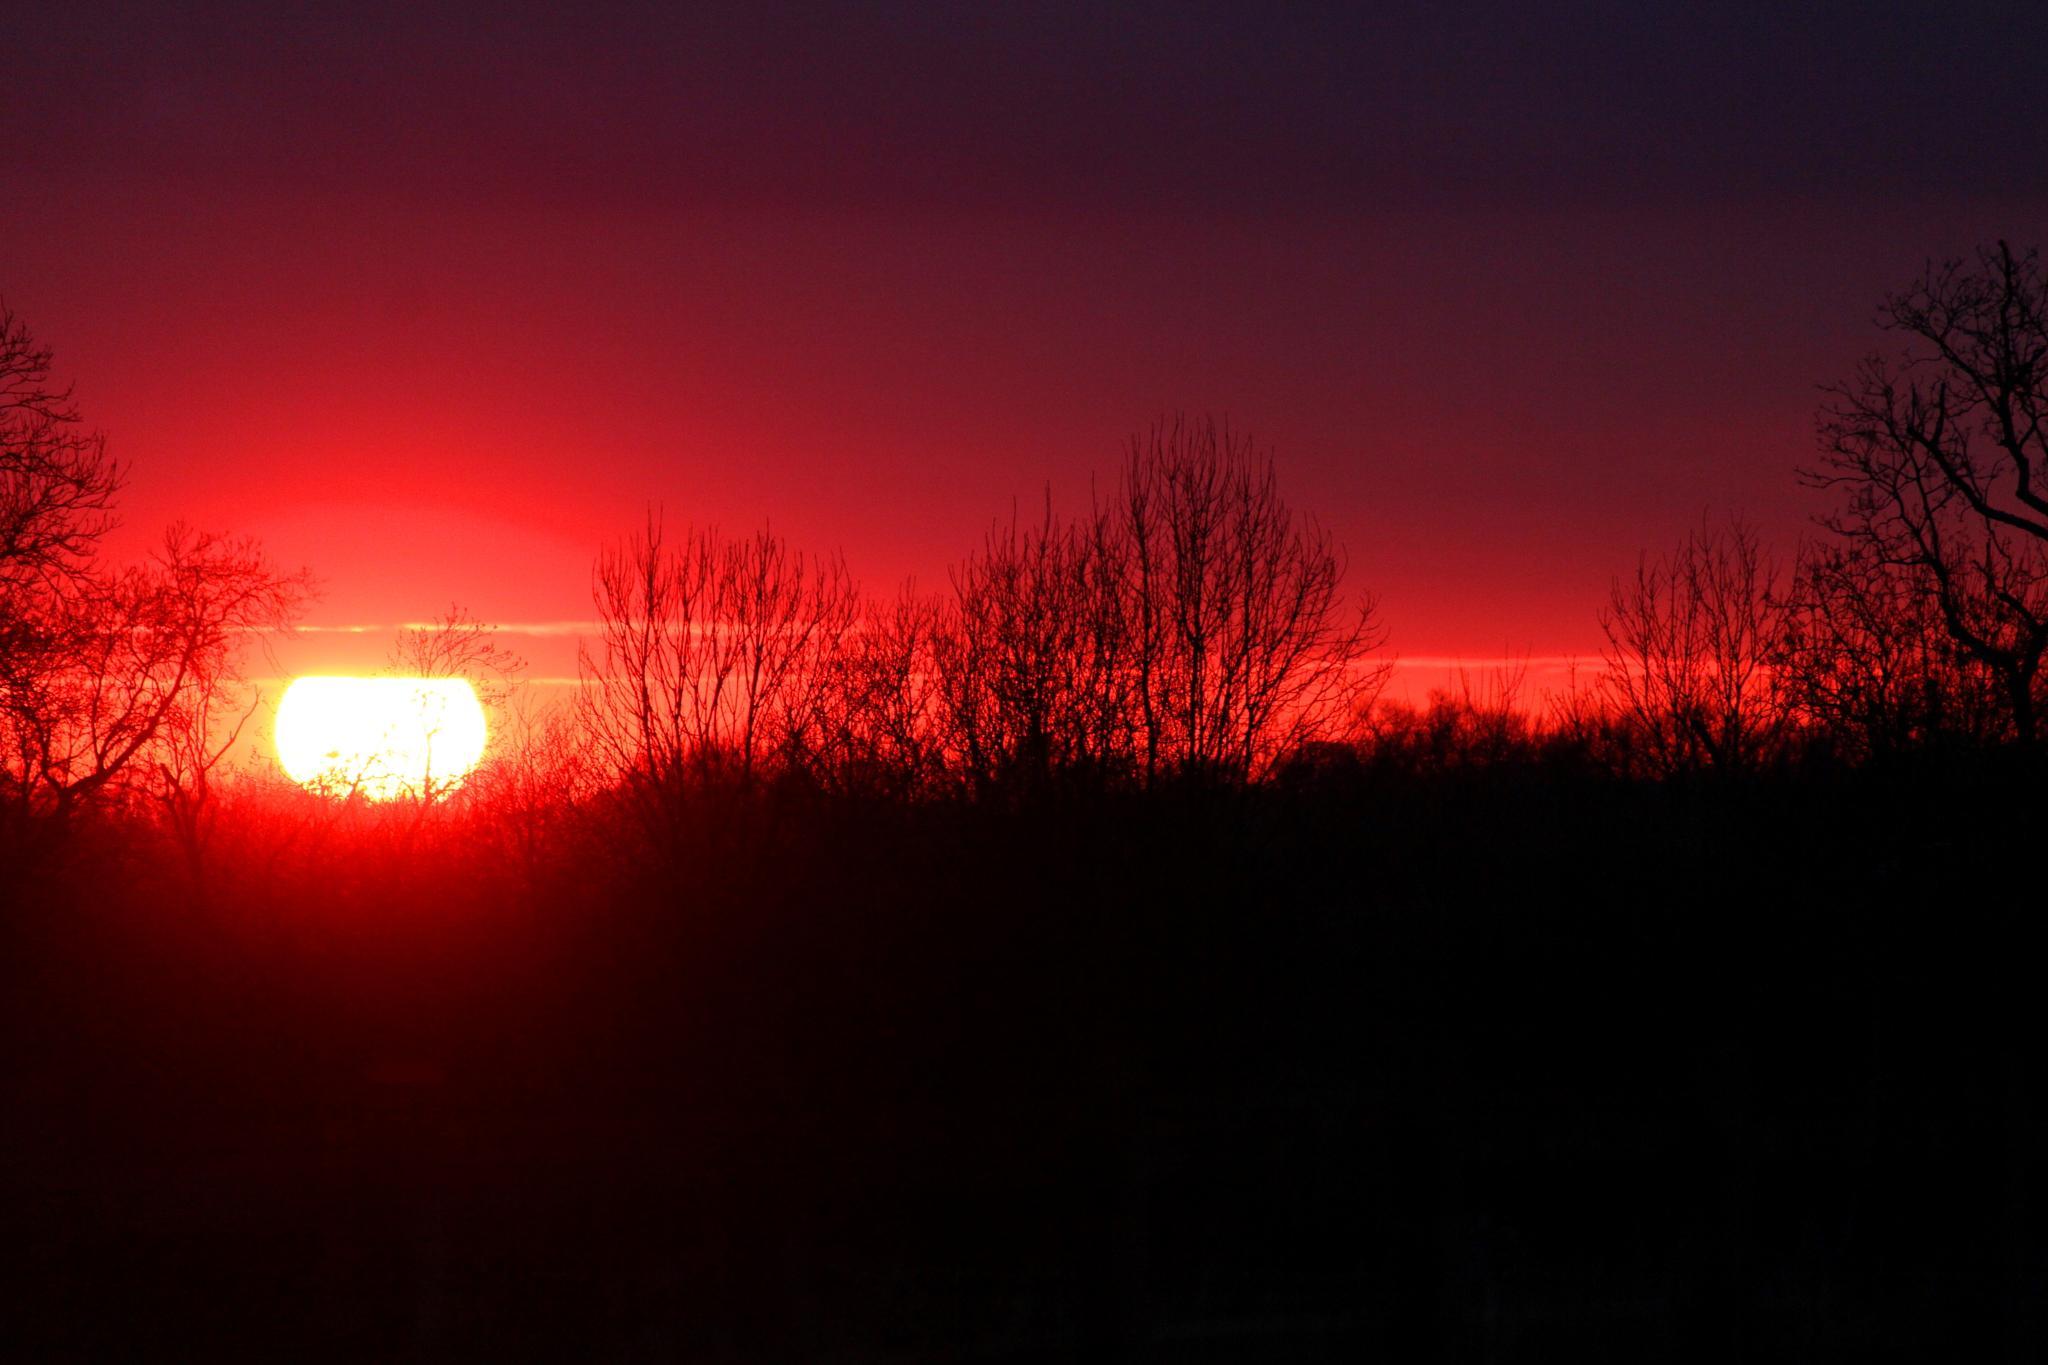 Bright eye red sky by Mofo